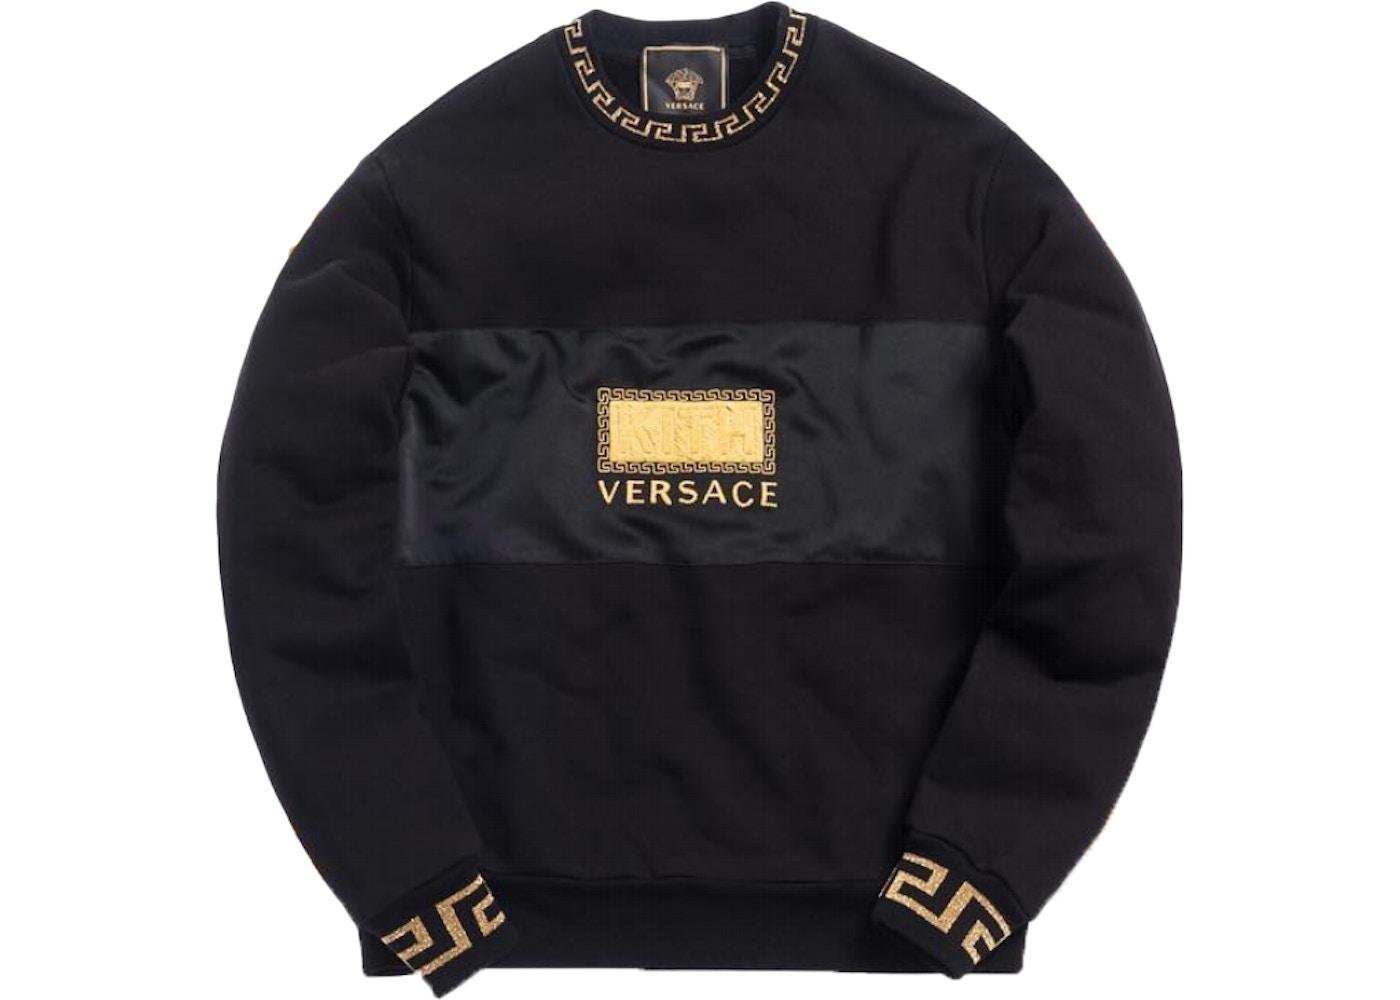 8ee57ed9 Kith x Versace Women's Greek Key Crewneck Black - SS19